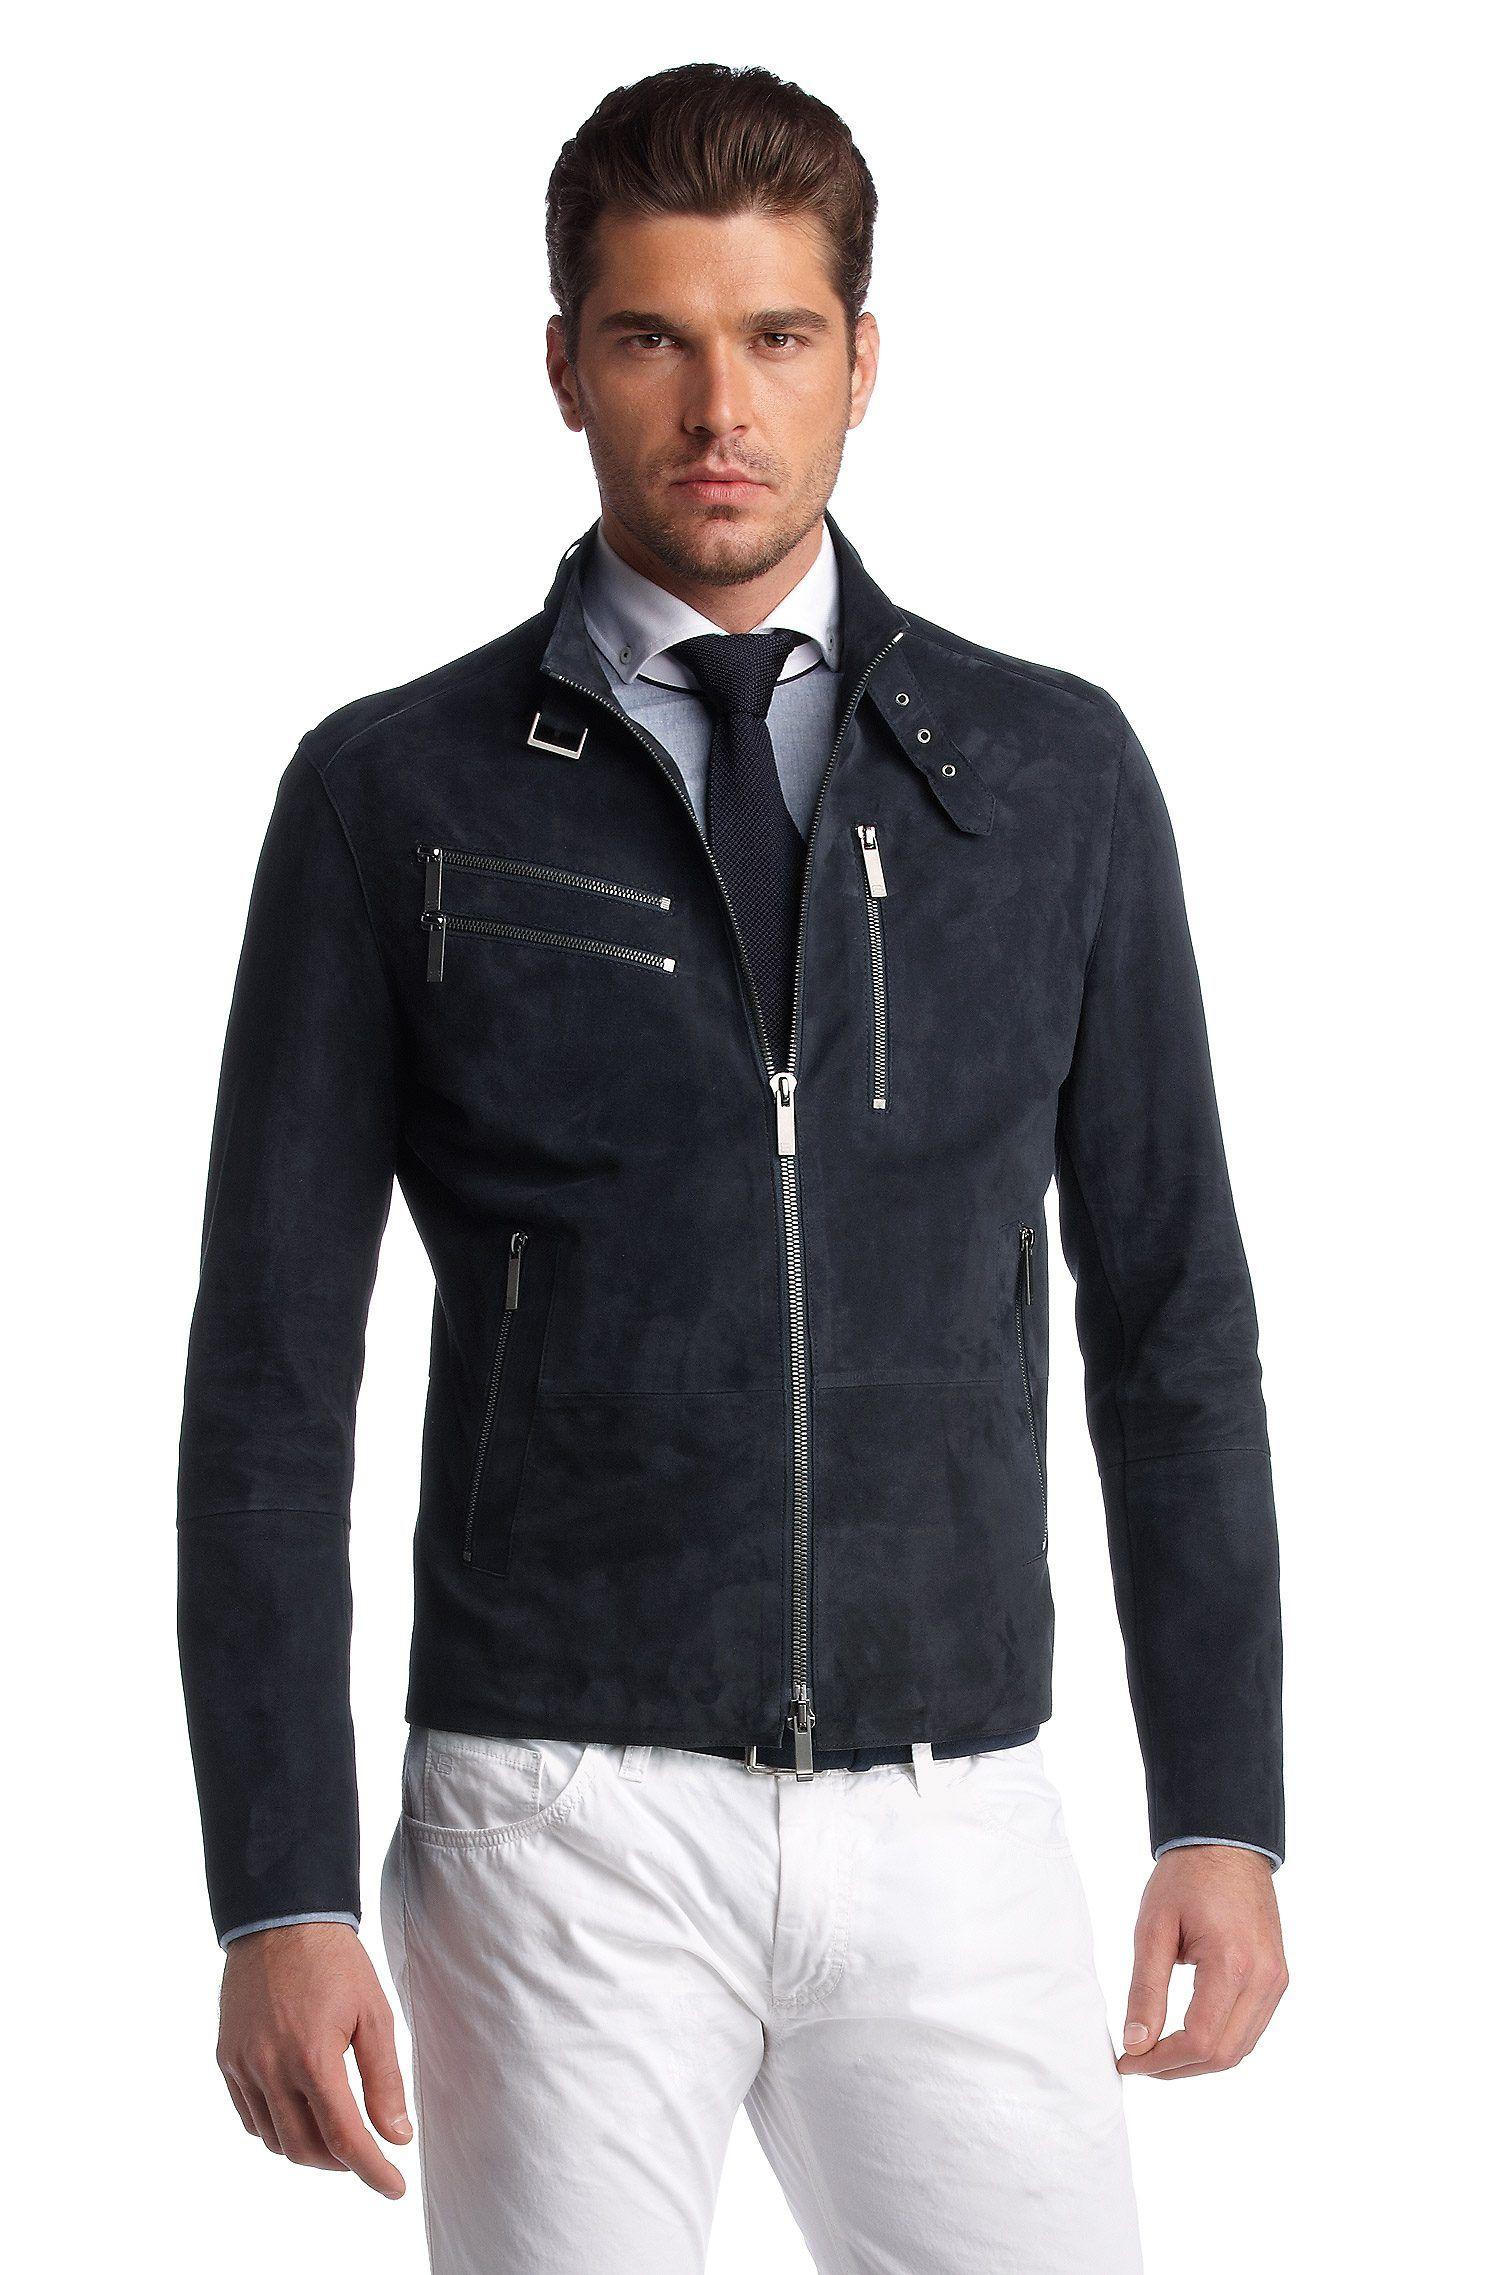 Hugo Boss Leather Jacket Куртка, Мужская куртка, Модели